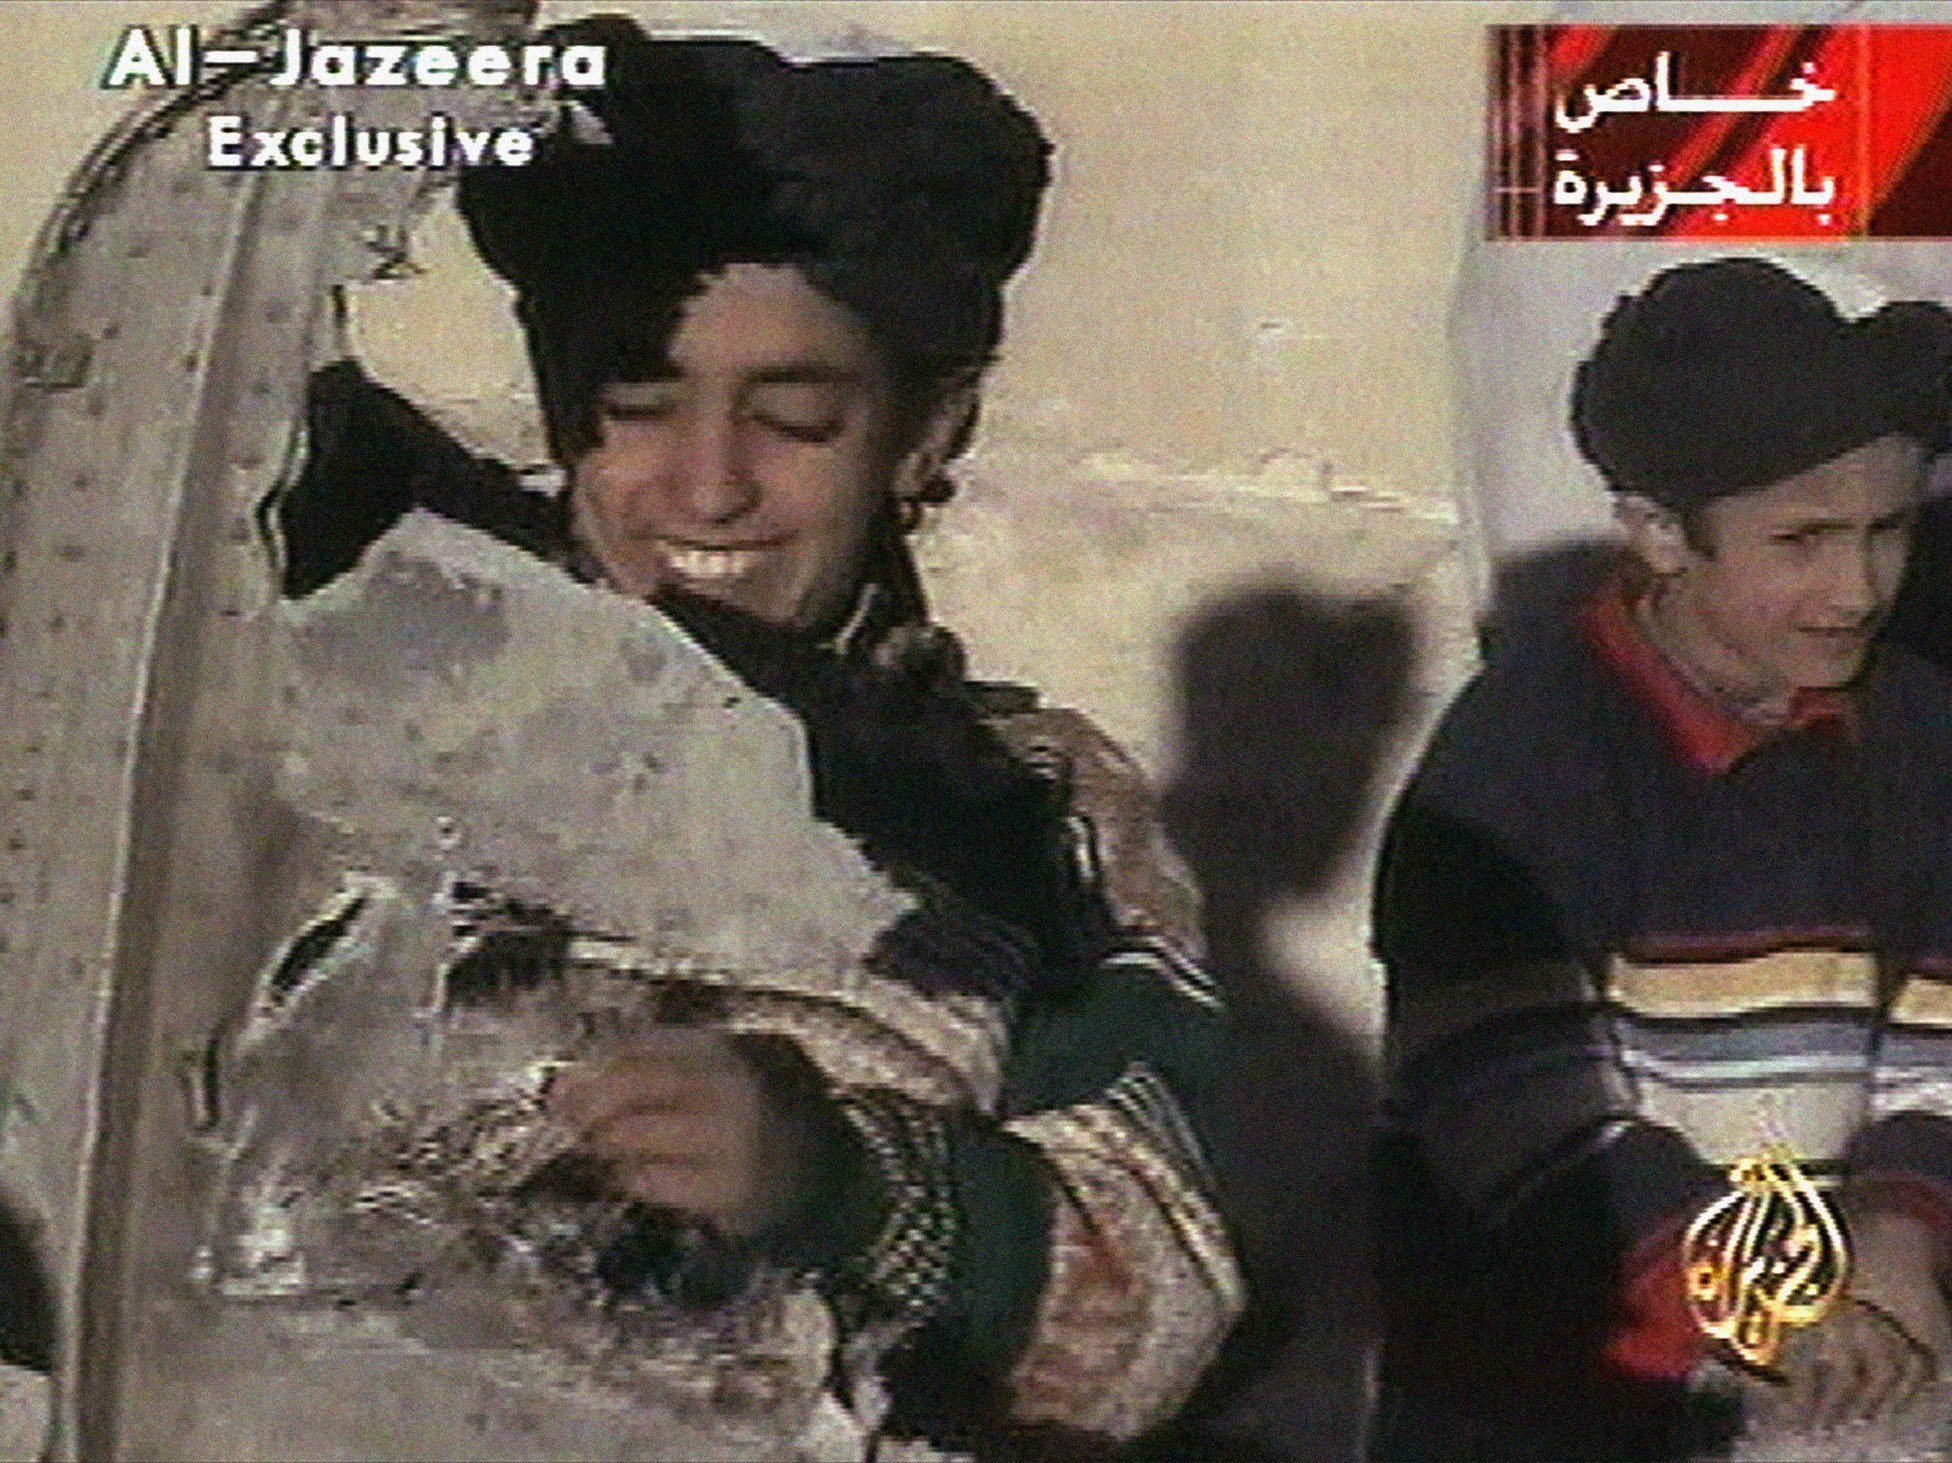 Osama Bin Laden's Son Hamza Added To U.S. Terror Blacklist